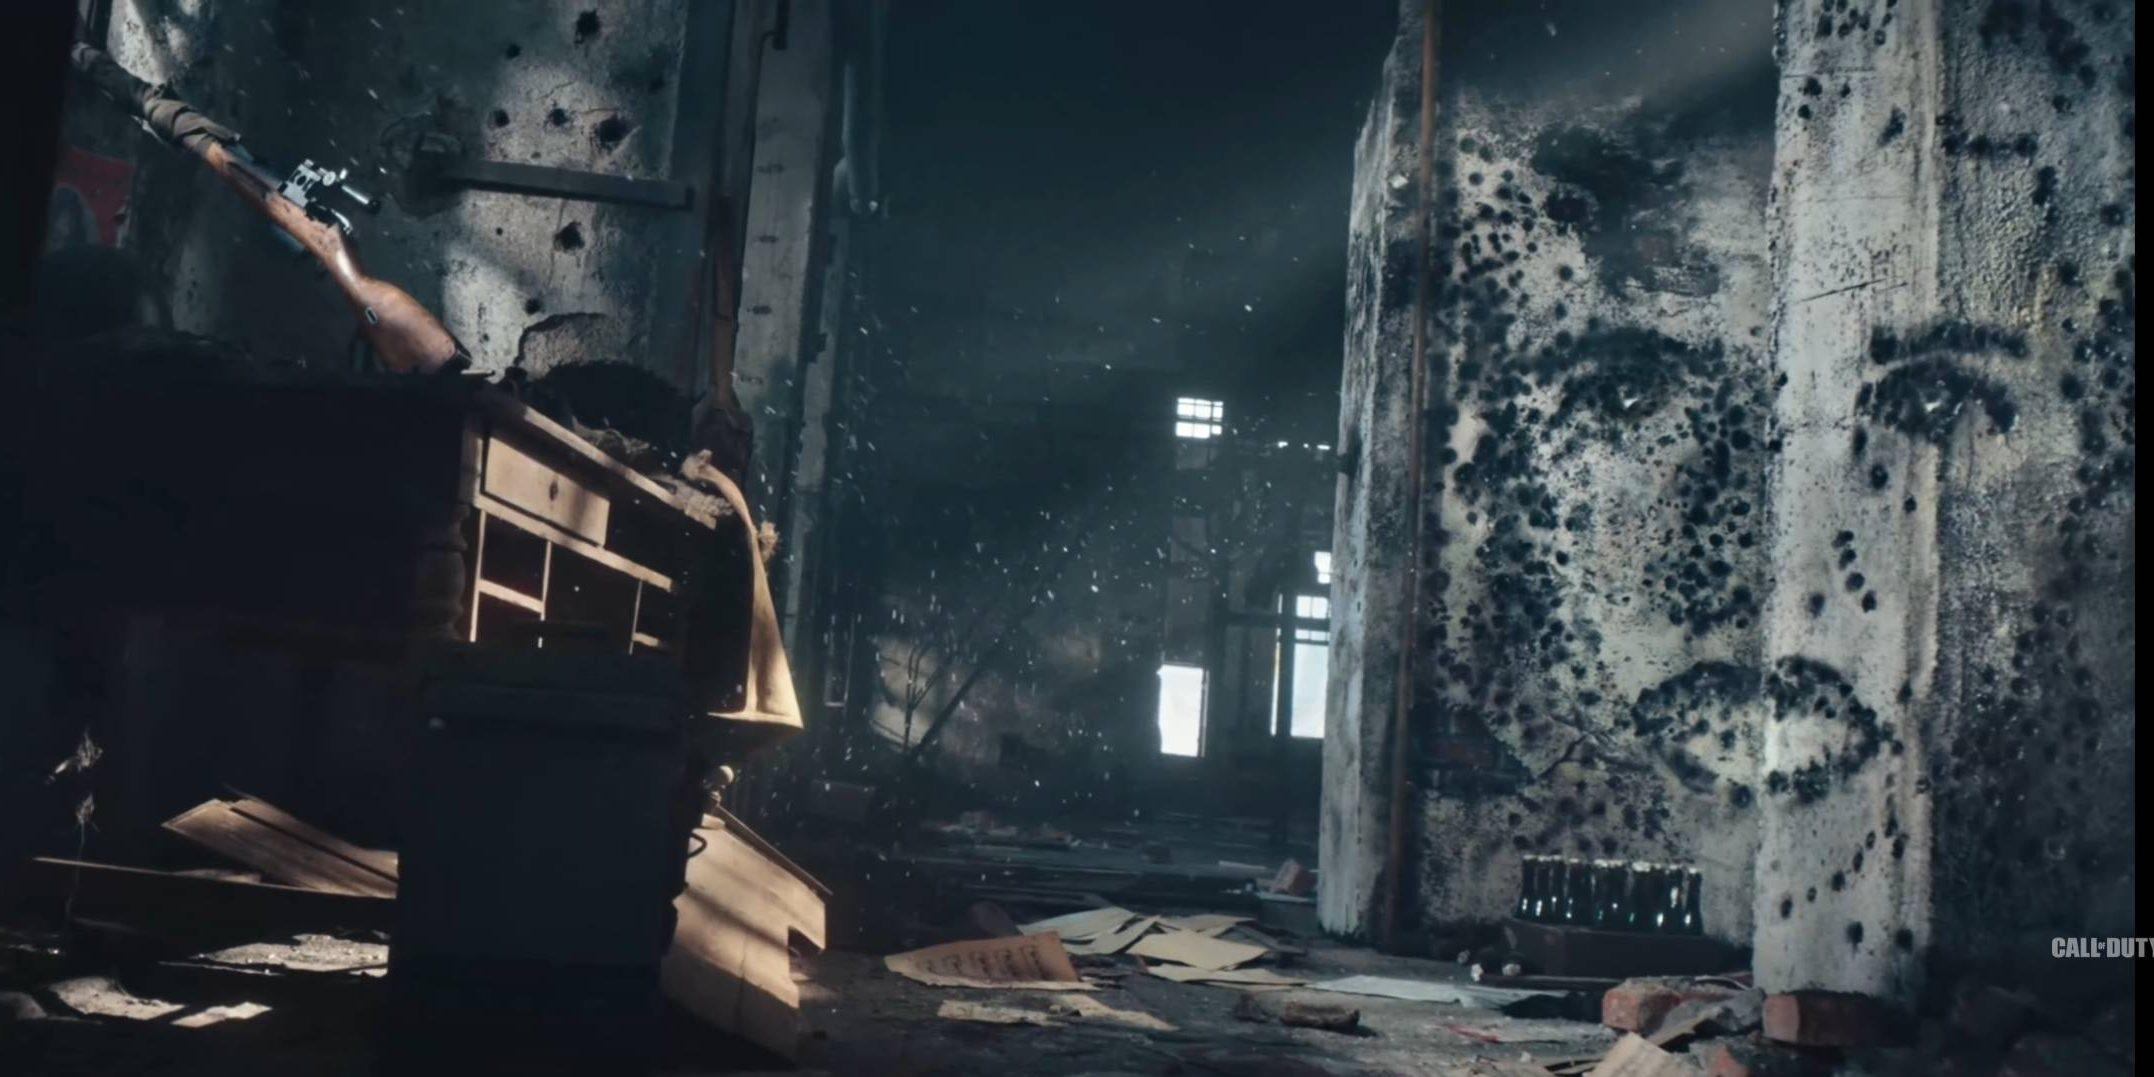 Call Of Duty Vanguard Release Date